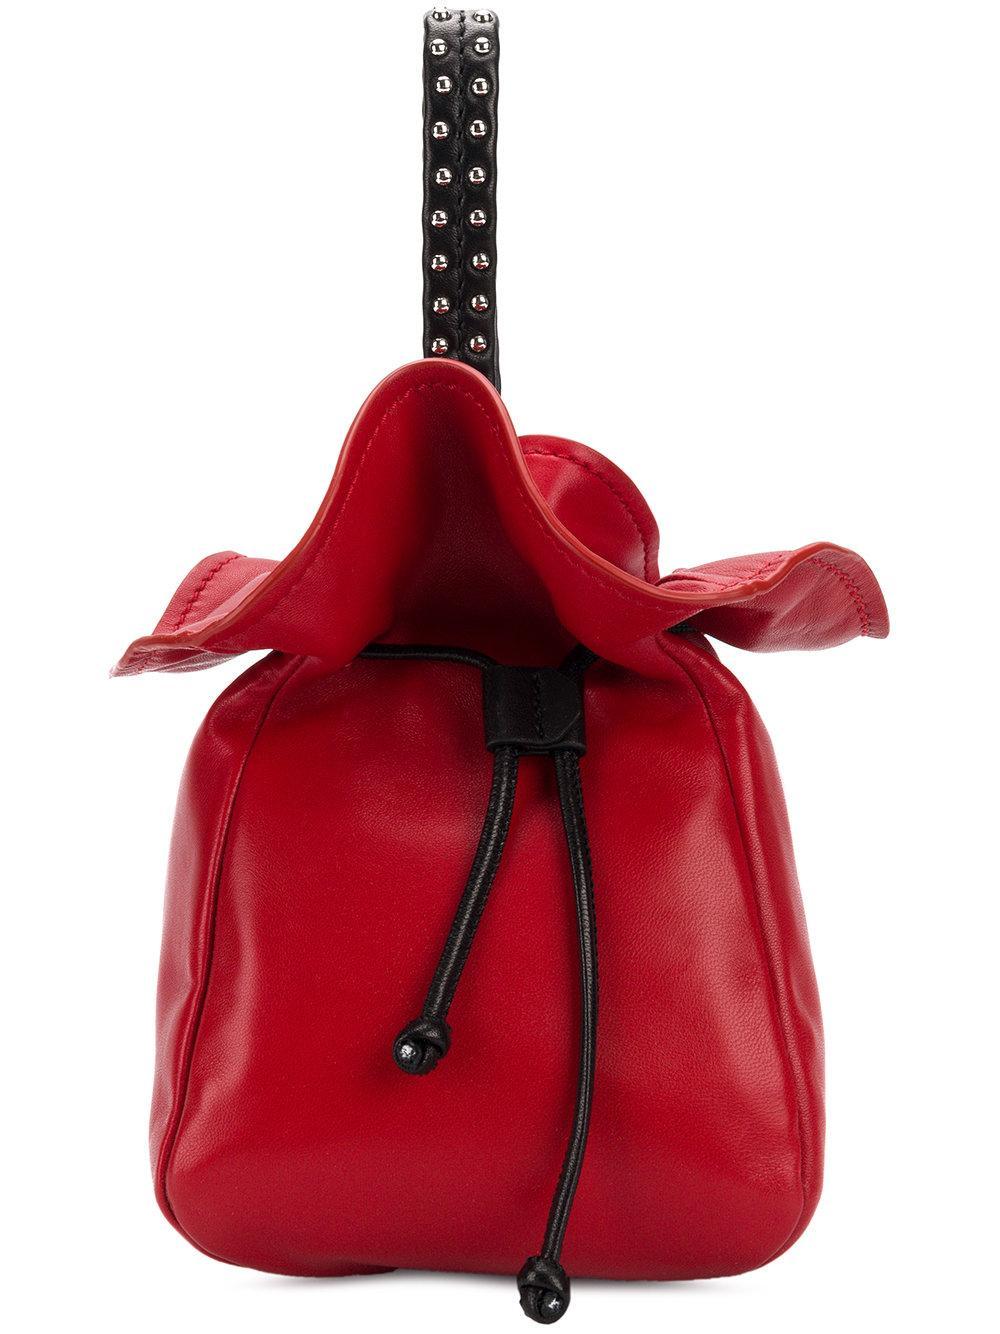 3.1 Phillip Lim Ray Mini Glove Pouch - Red